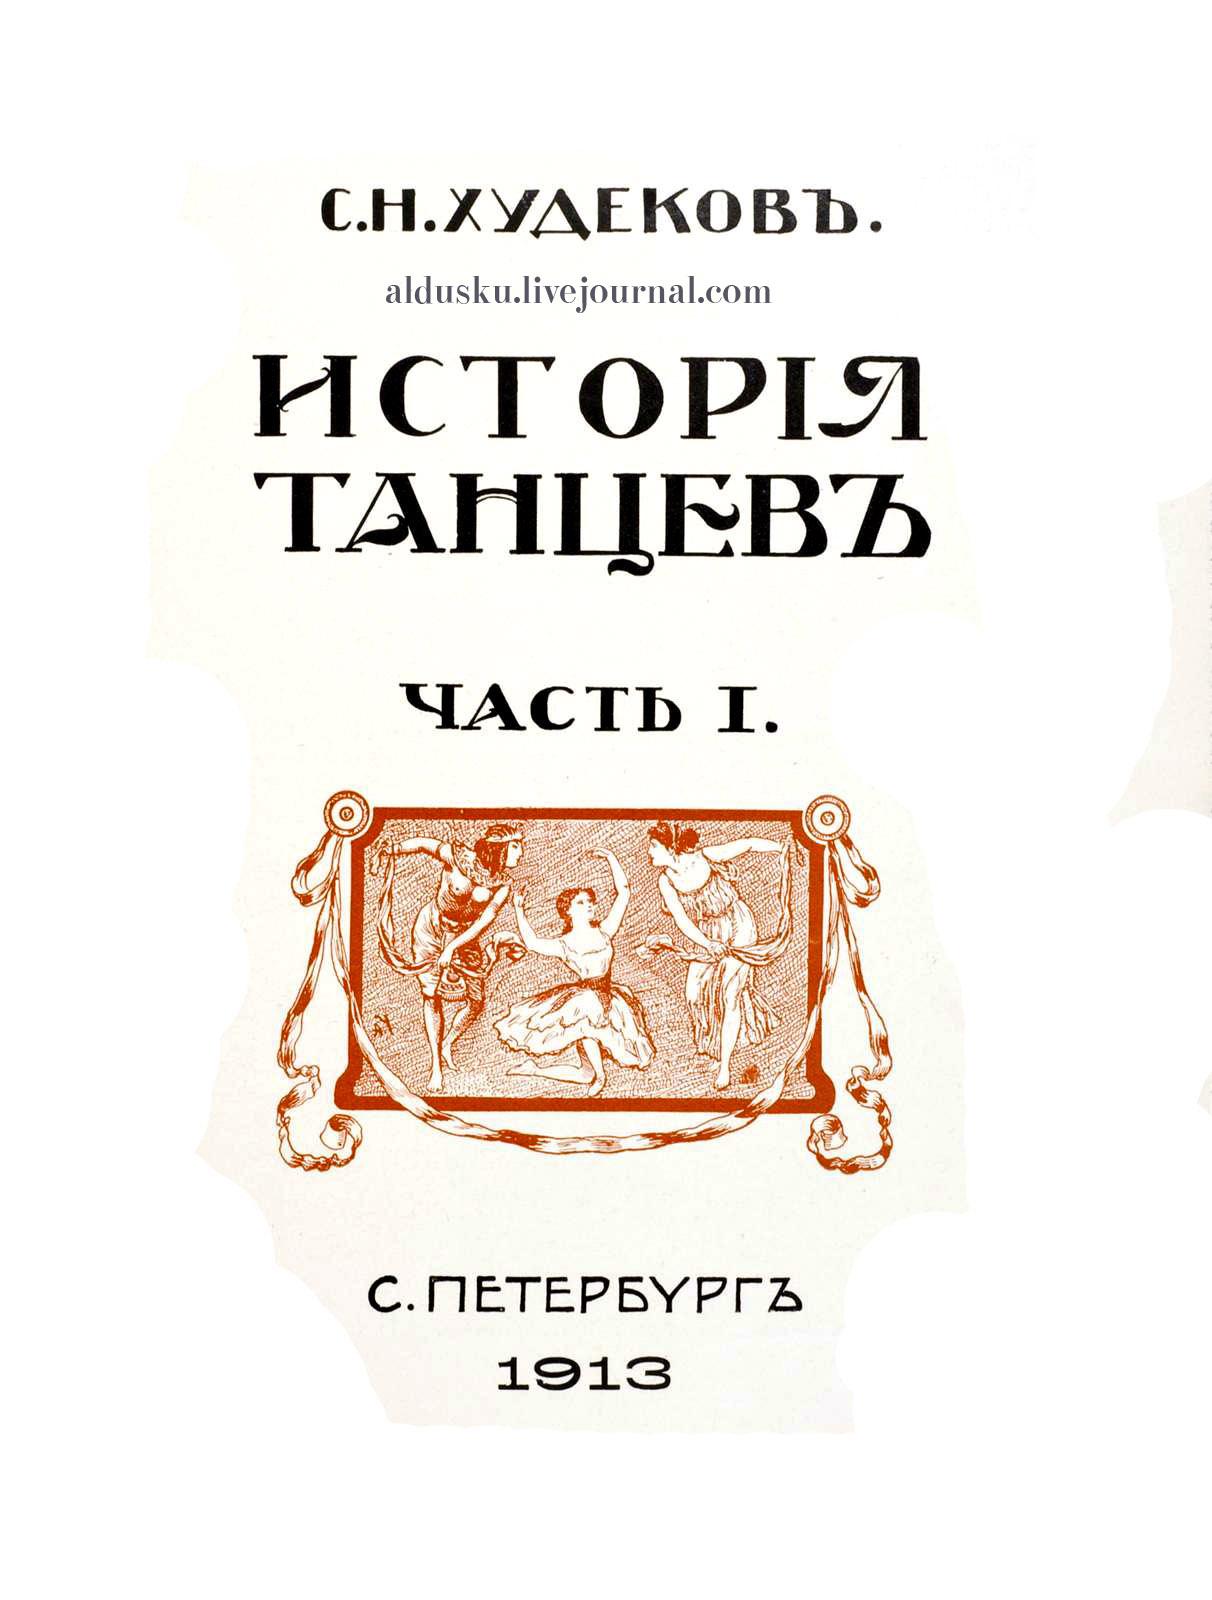 «История танцев» С.Н. Худекова.